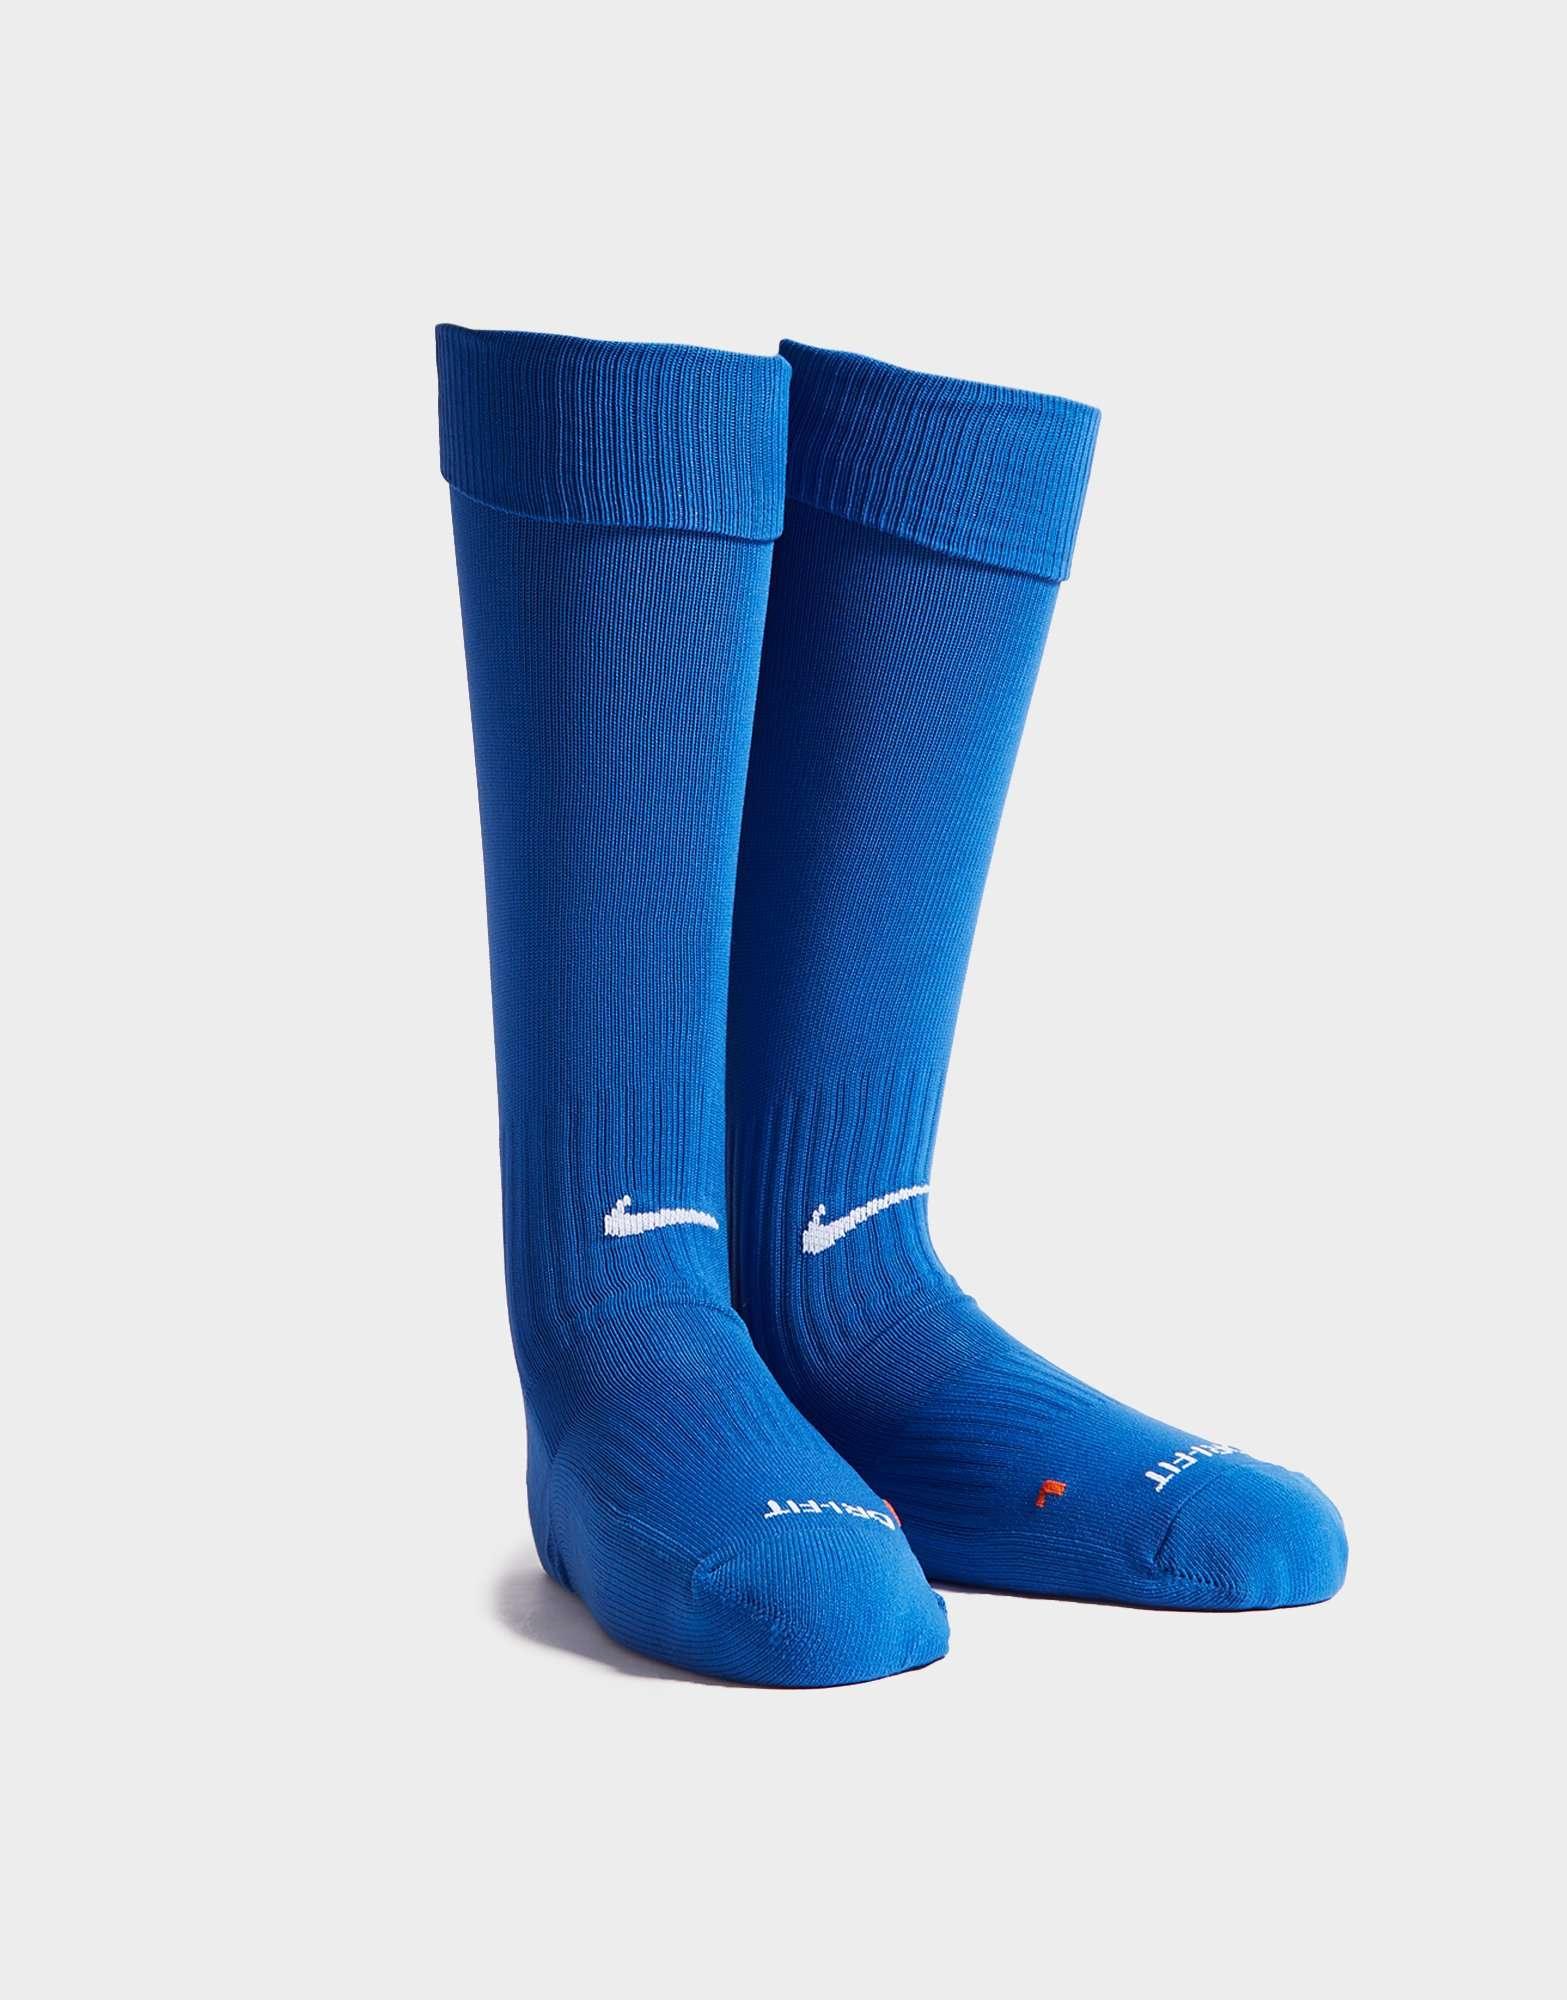 nike socks size guide uk